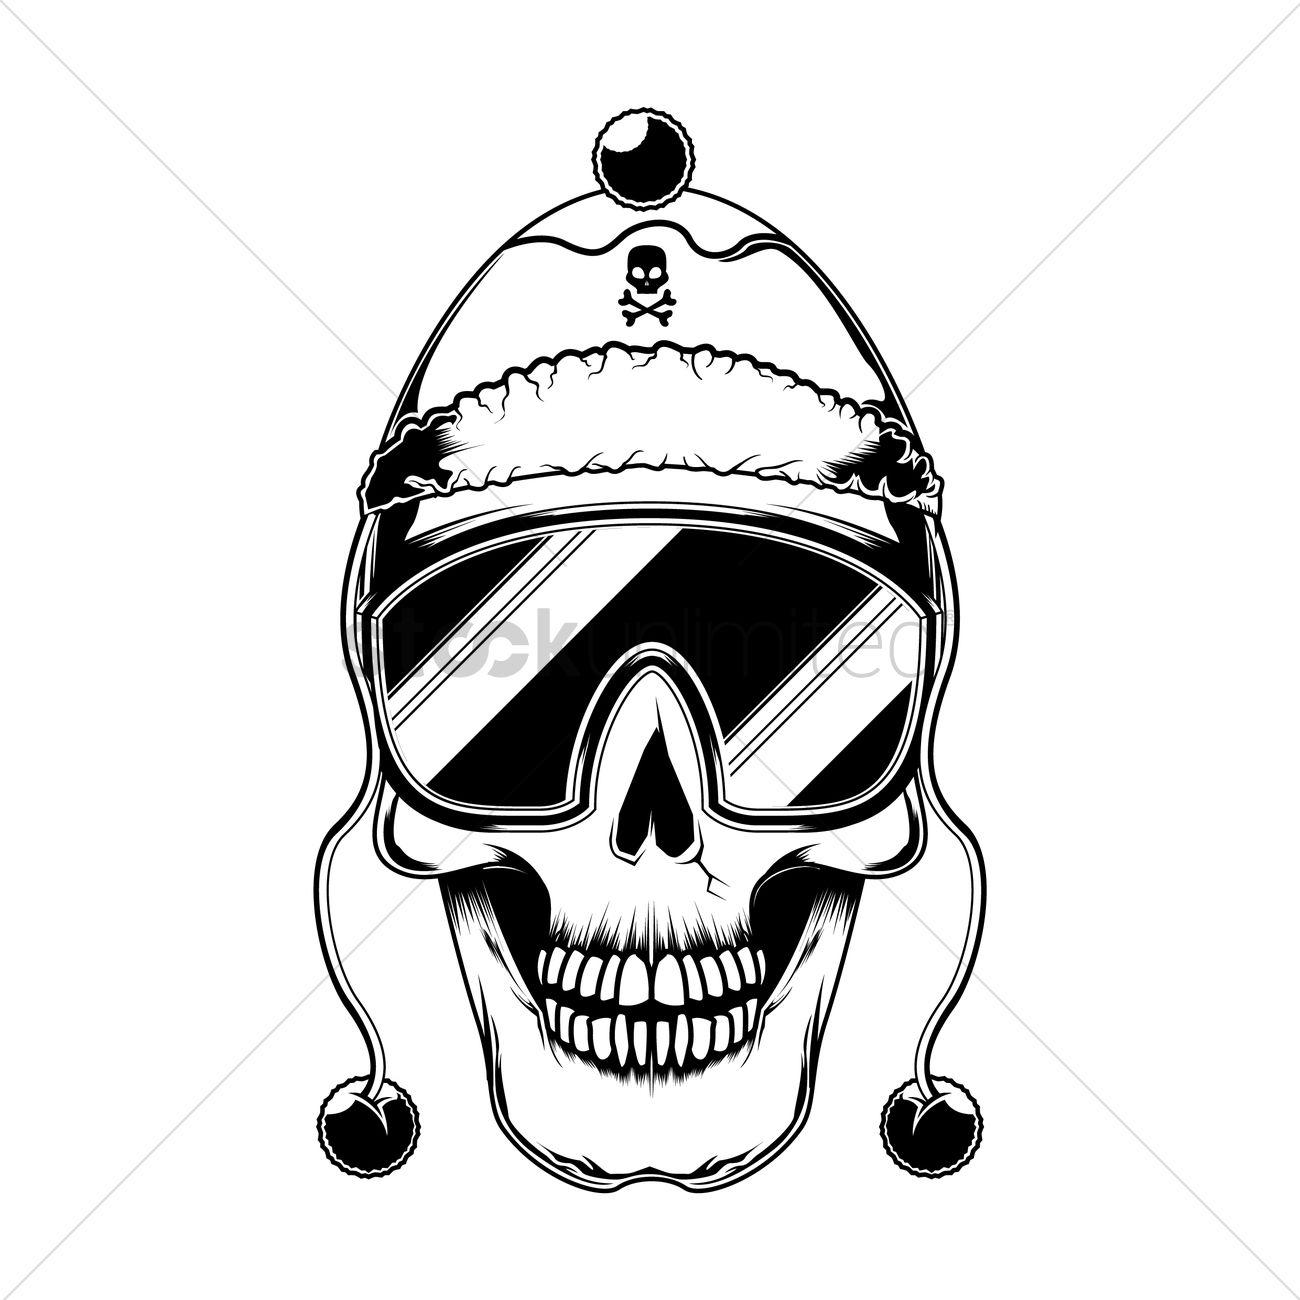 1300x1300 Skull With Beanie Cap Vector Image